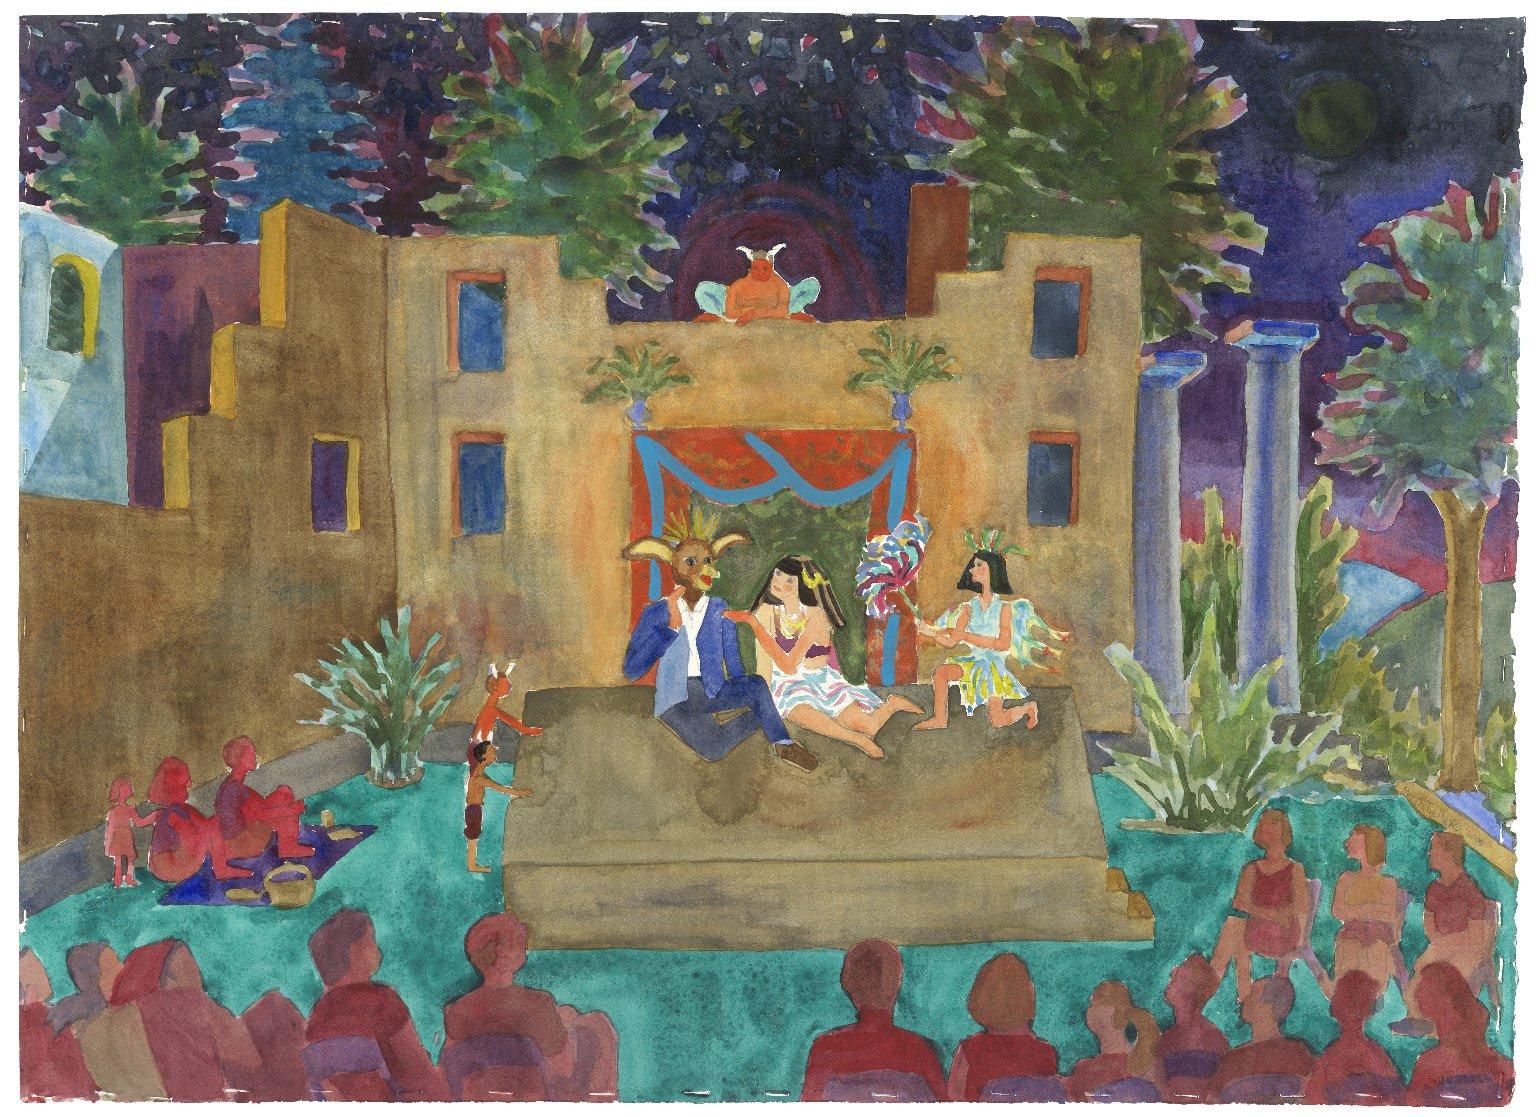 Chesapeake Shakespeare Company's Midsummer Night's Dream at the Patapsco Female Institute [graphic]